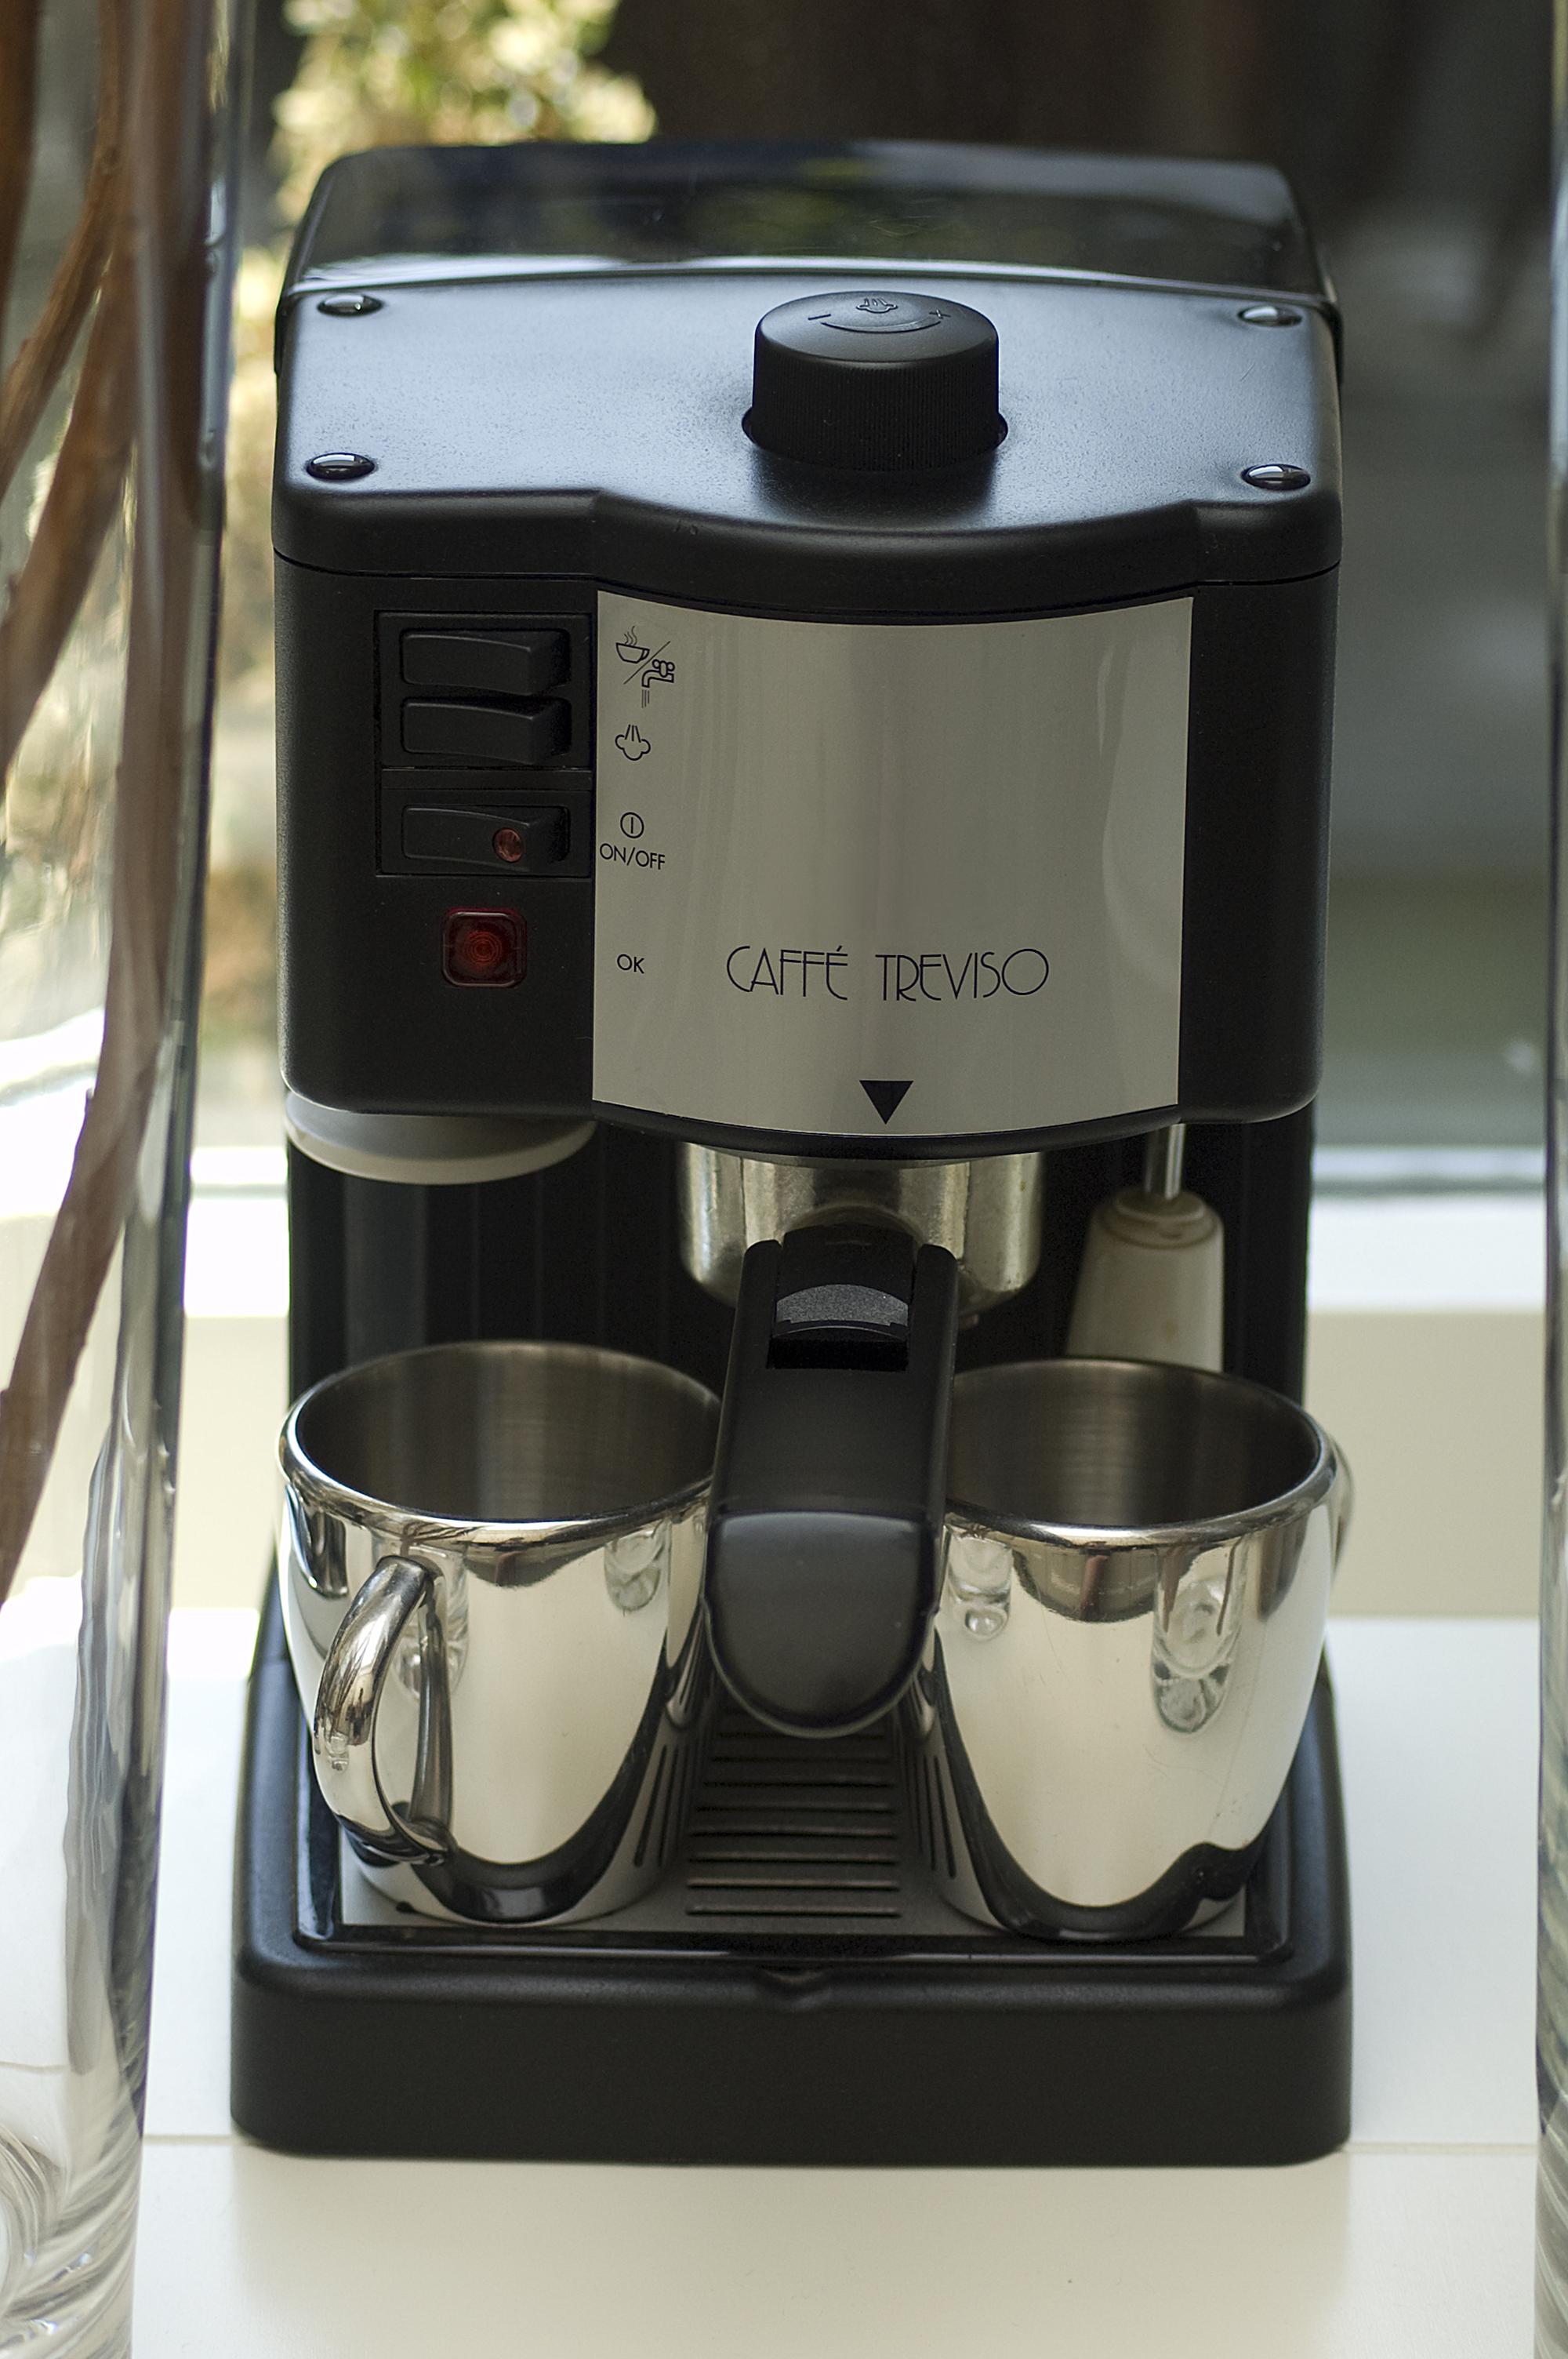 Cappuccino machine photo